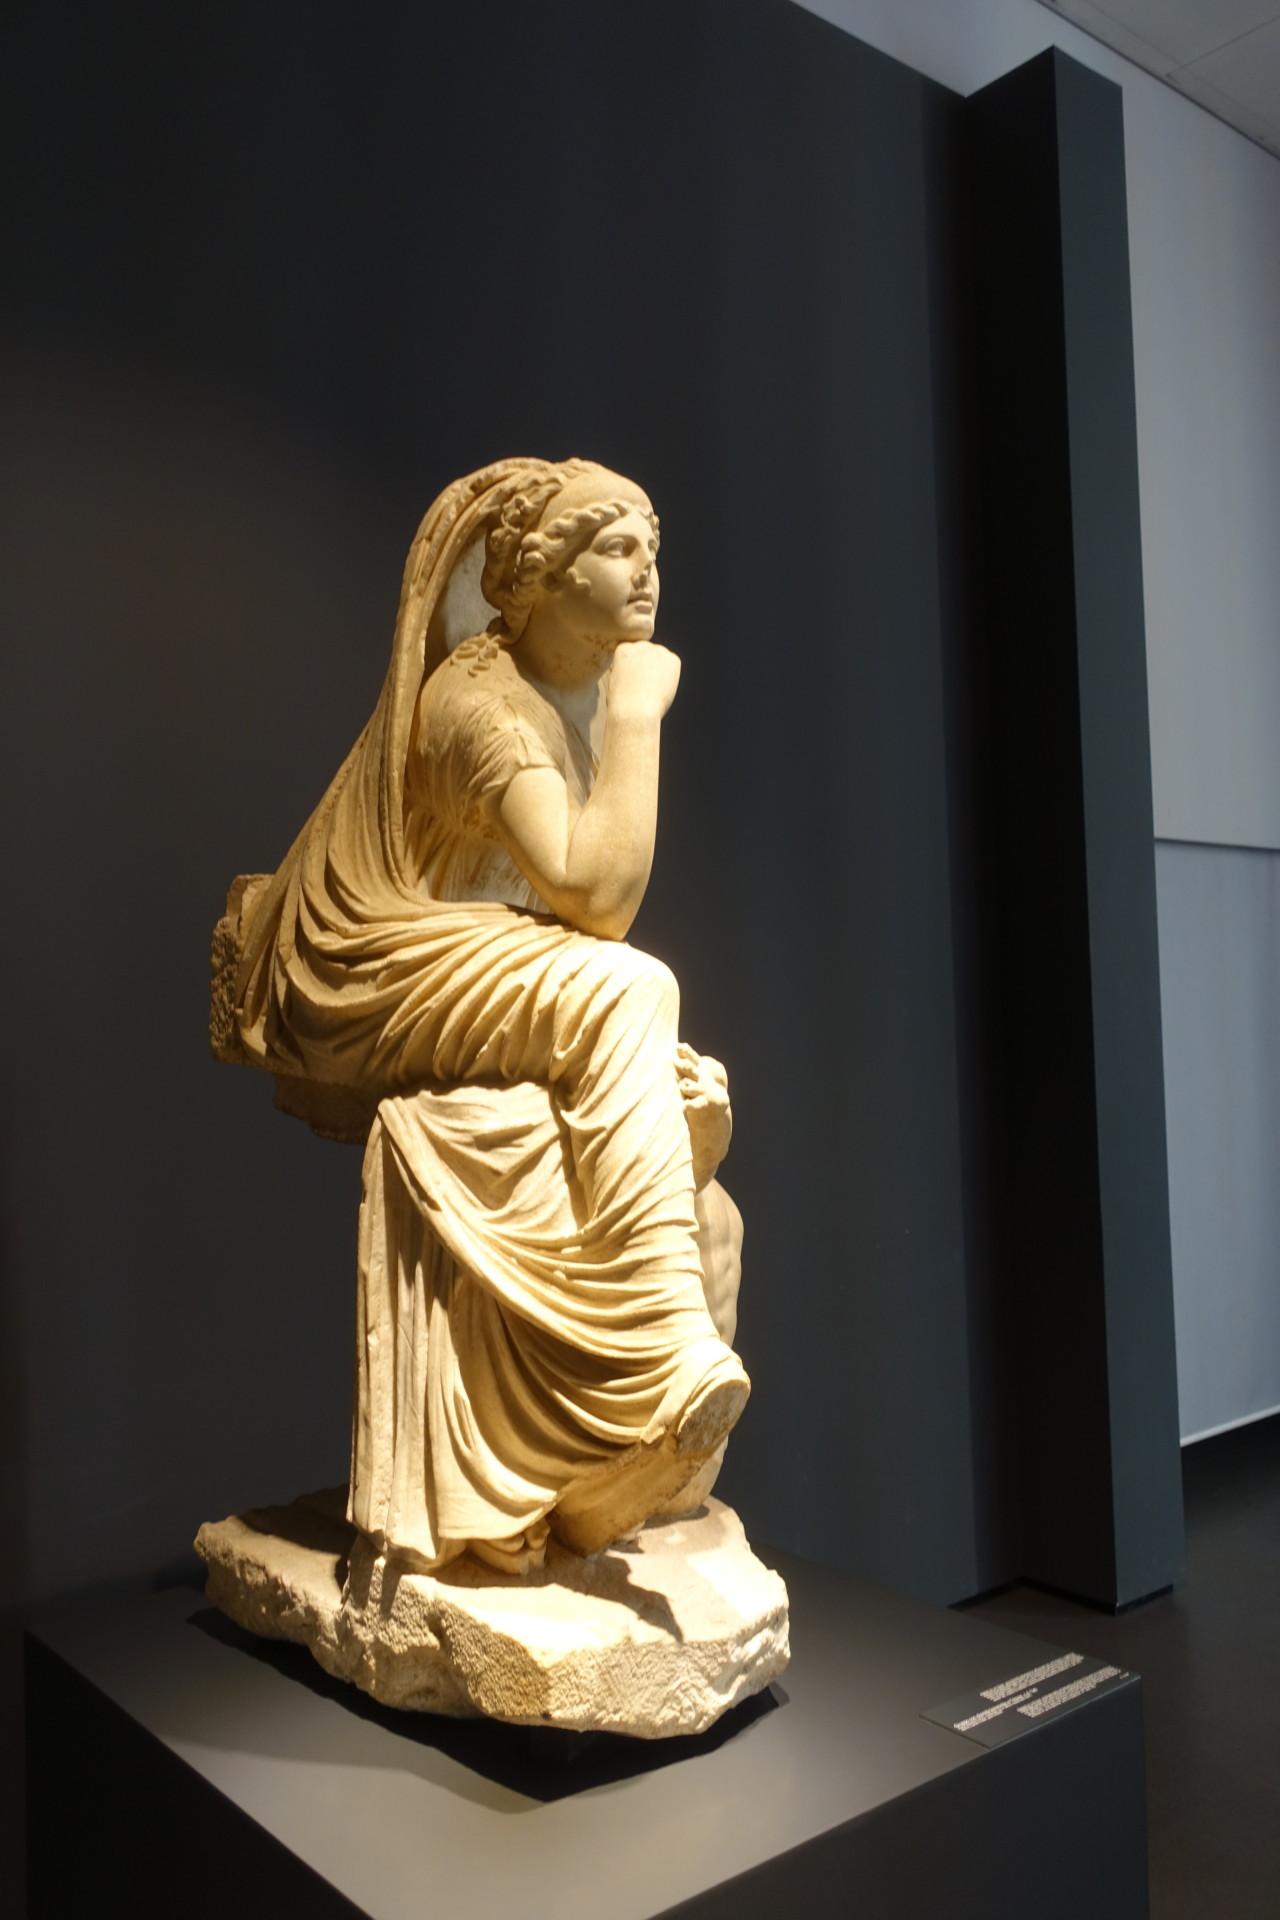 Mal schaun, was kommt - im Palazzo Massimo, römische Skulptur